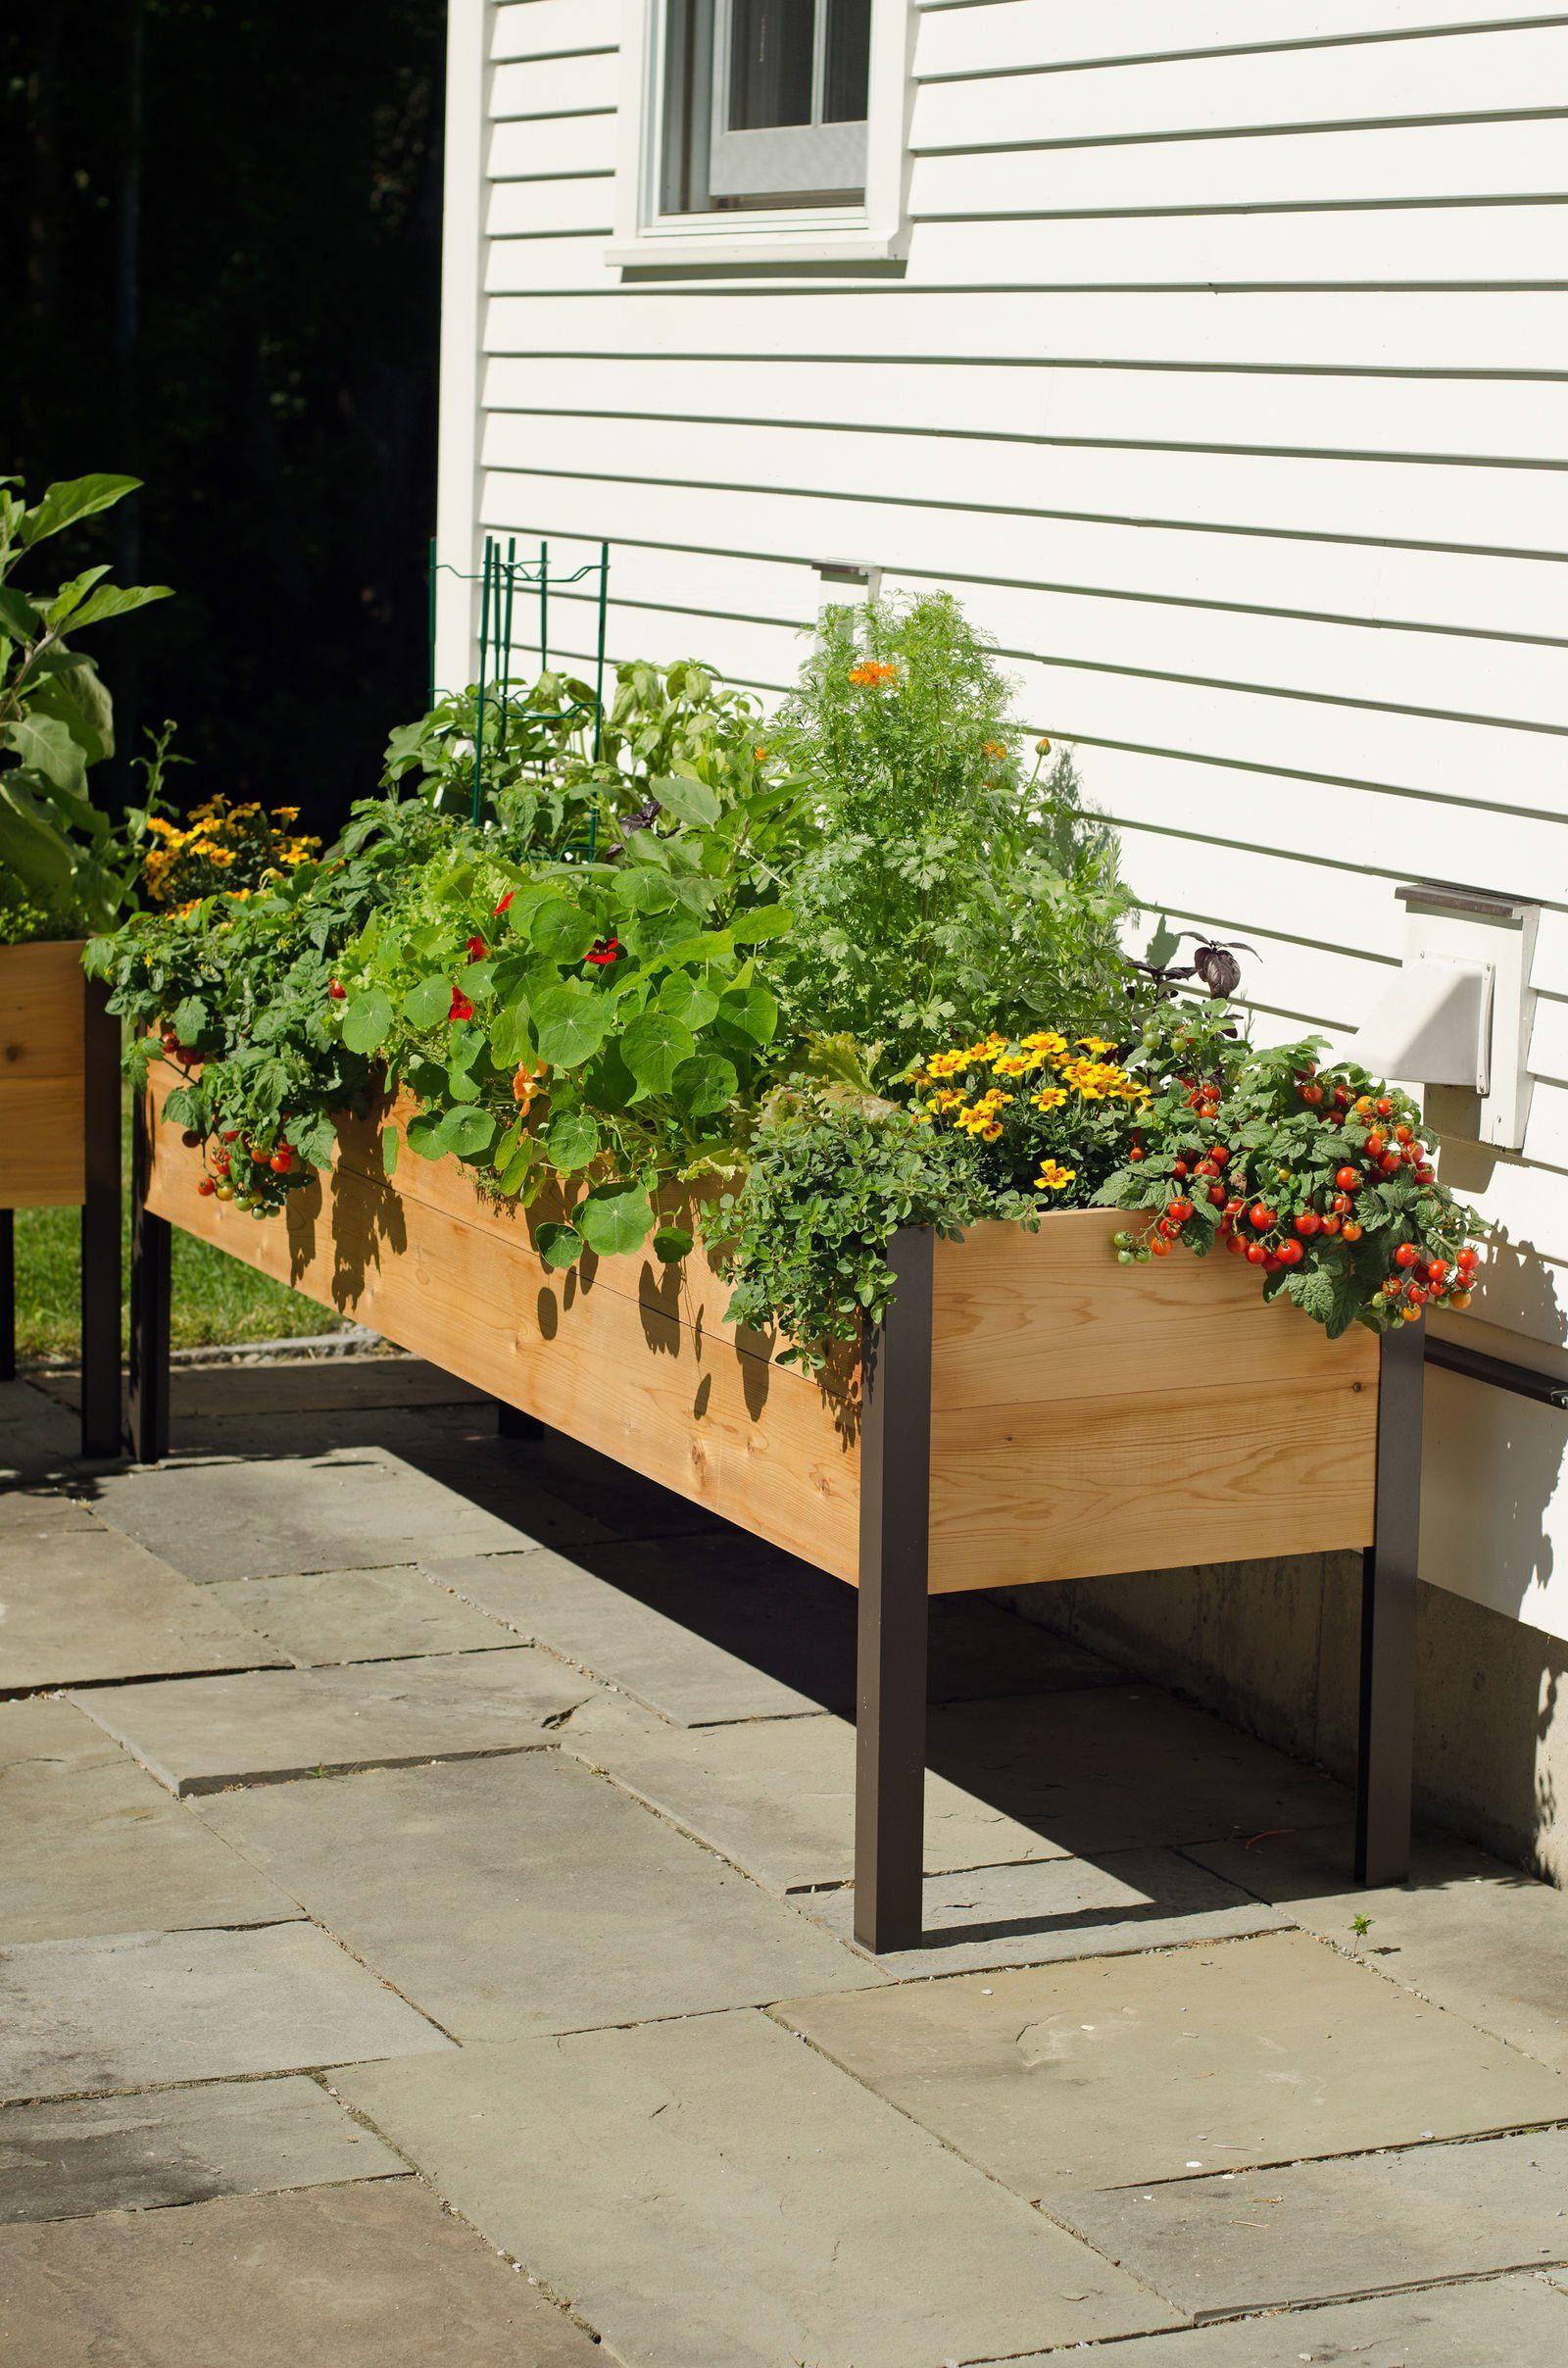 Amazoncom Elevated Cedar Planter Box, 2 X 8 Raised